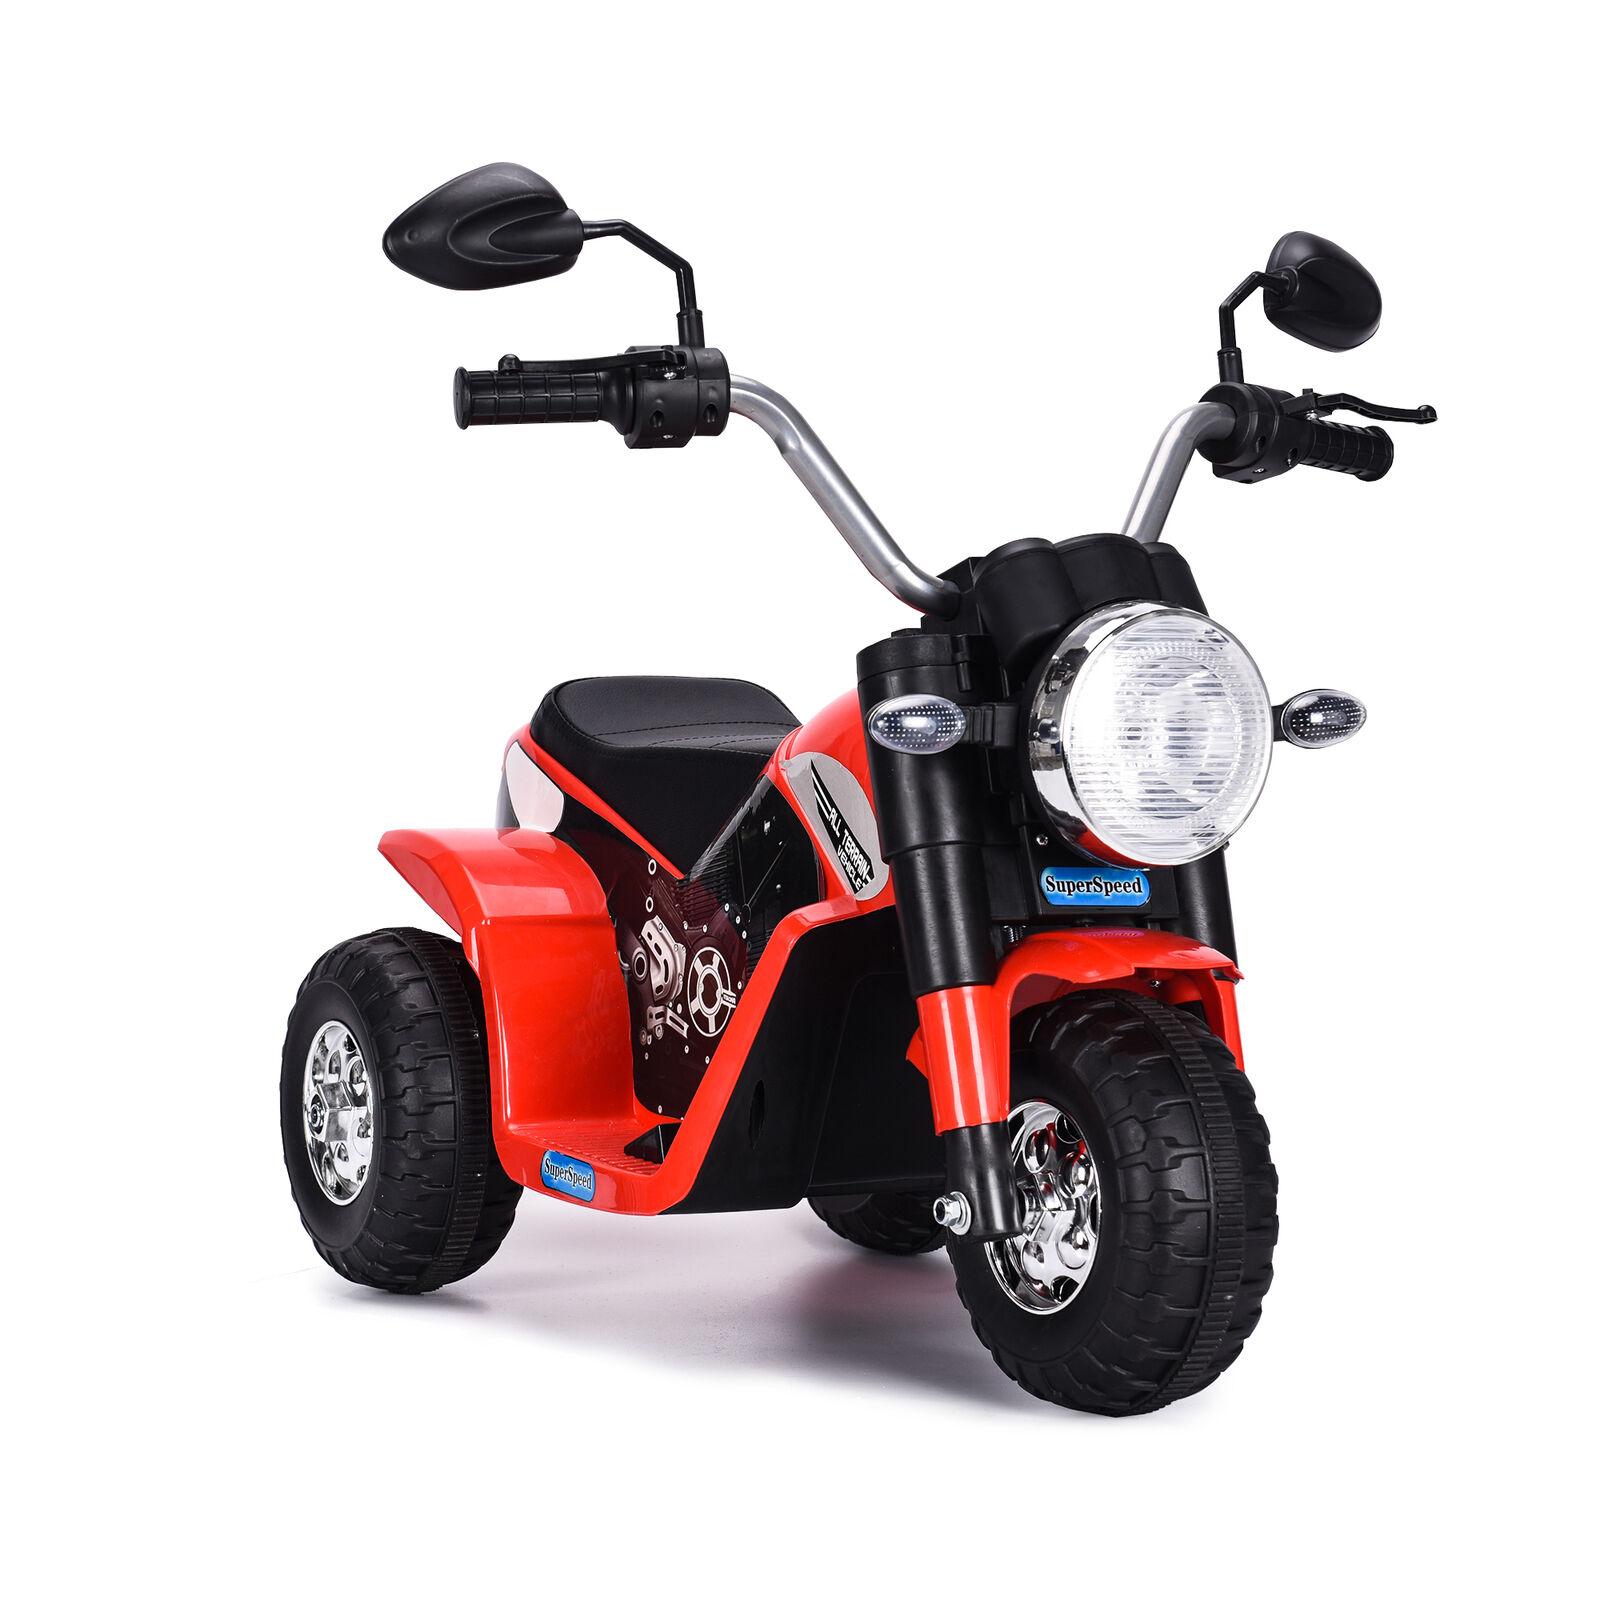 Bakaji Moto Baby Rosso LT889 Bianco Tre Ruote Volante Alto Harley 1 x 6V 4,5 Ah